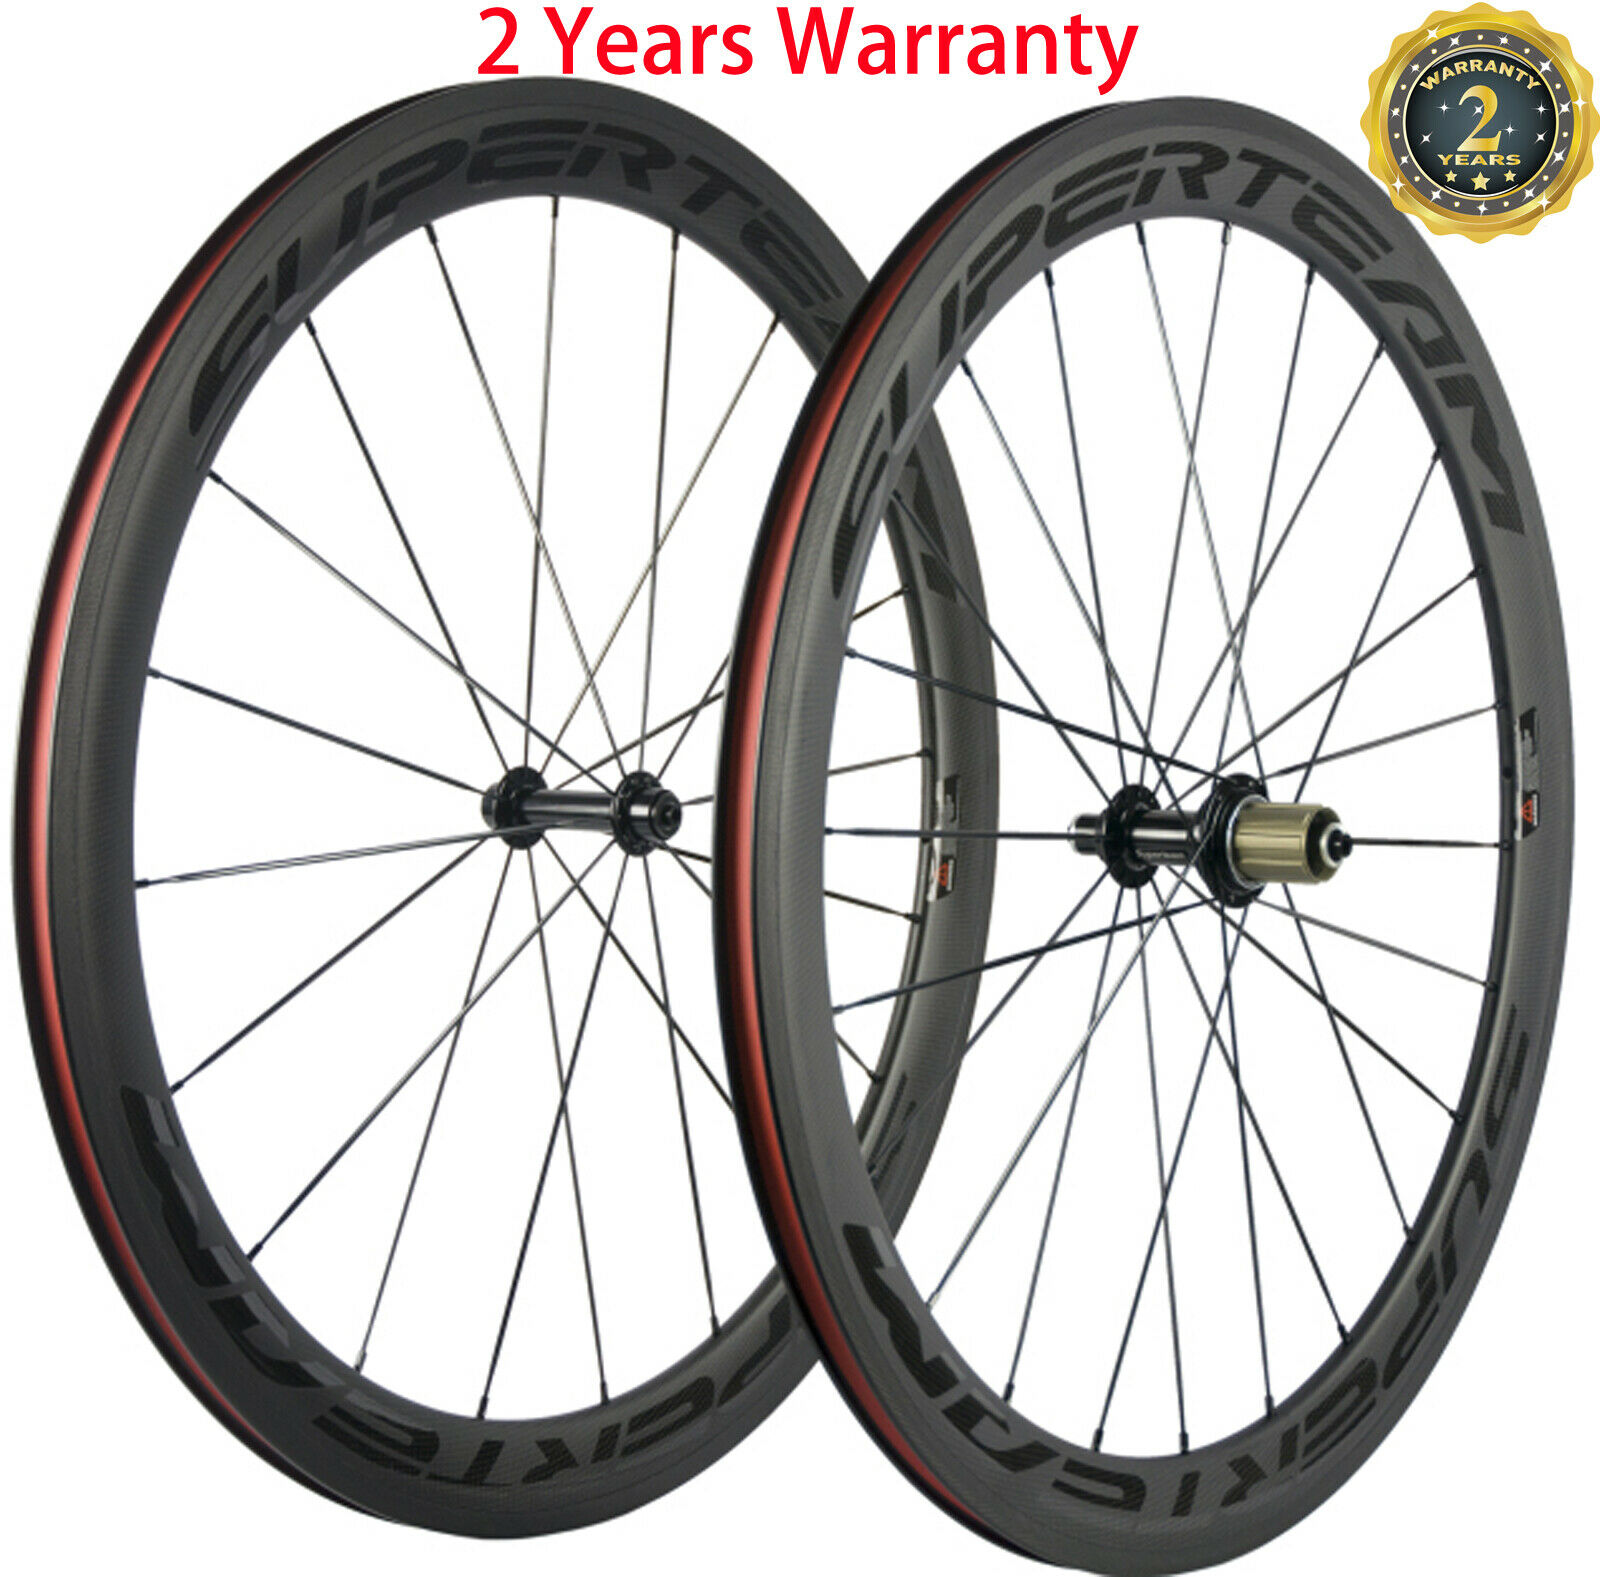 SUPERTEAM 50mm Bike Wheelset Carbon Clincher Wheels  Road Bike Race Wheels 700C  sale online save 70%